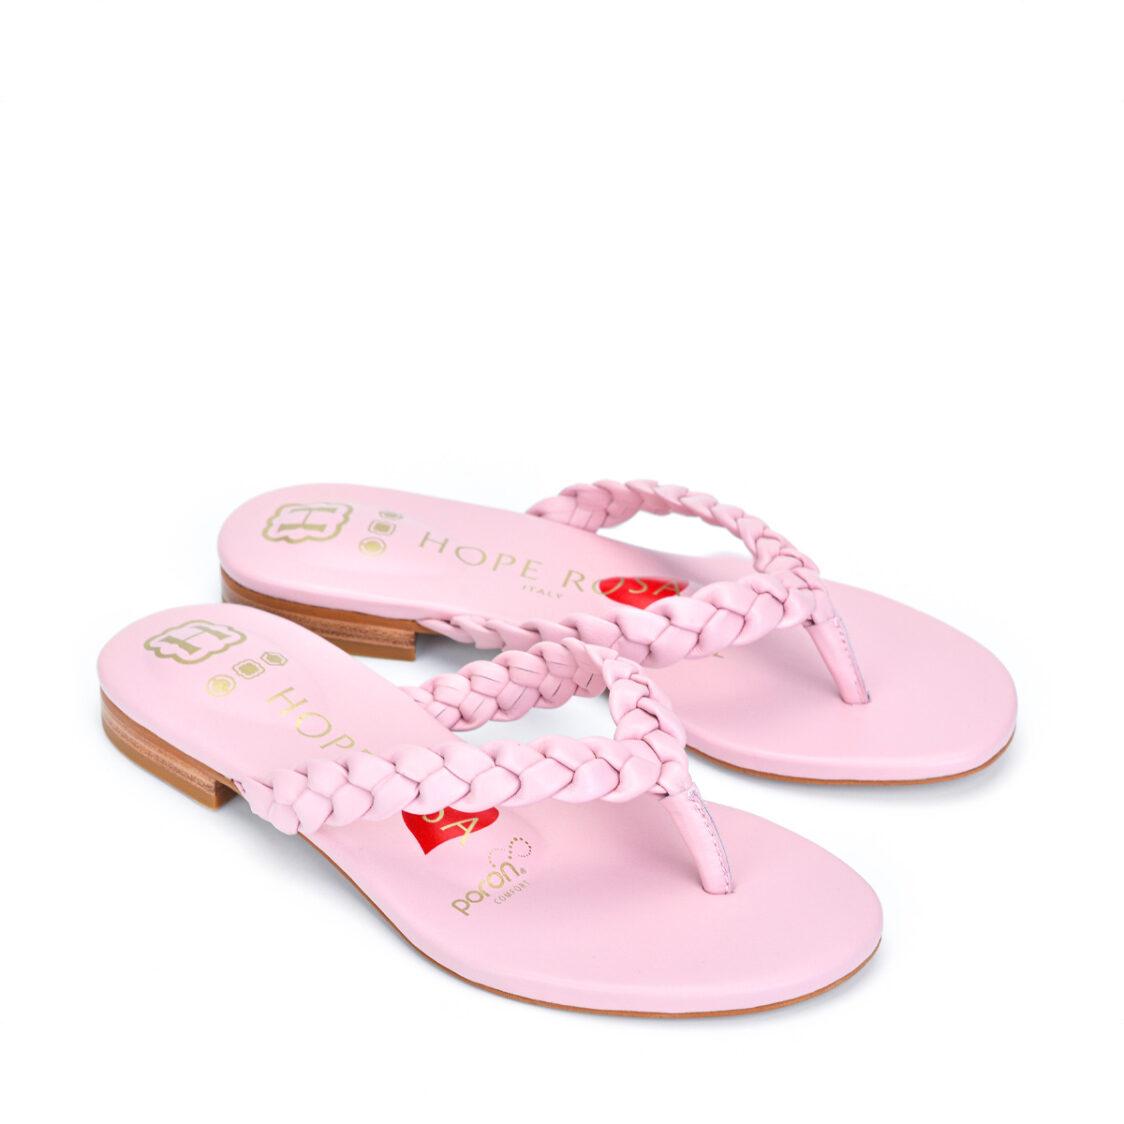 Hope Rosa Shiva Thongs Powder Pink